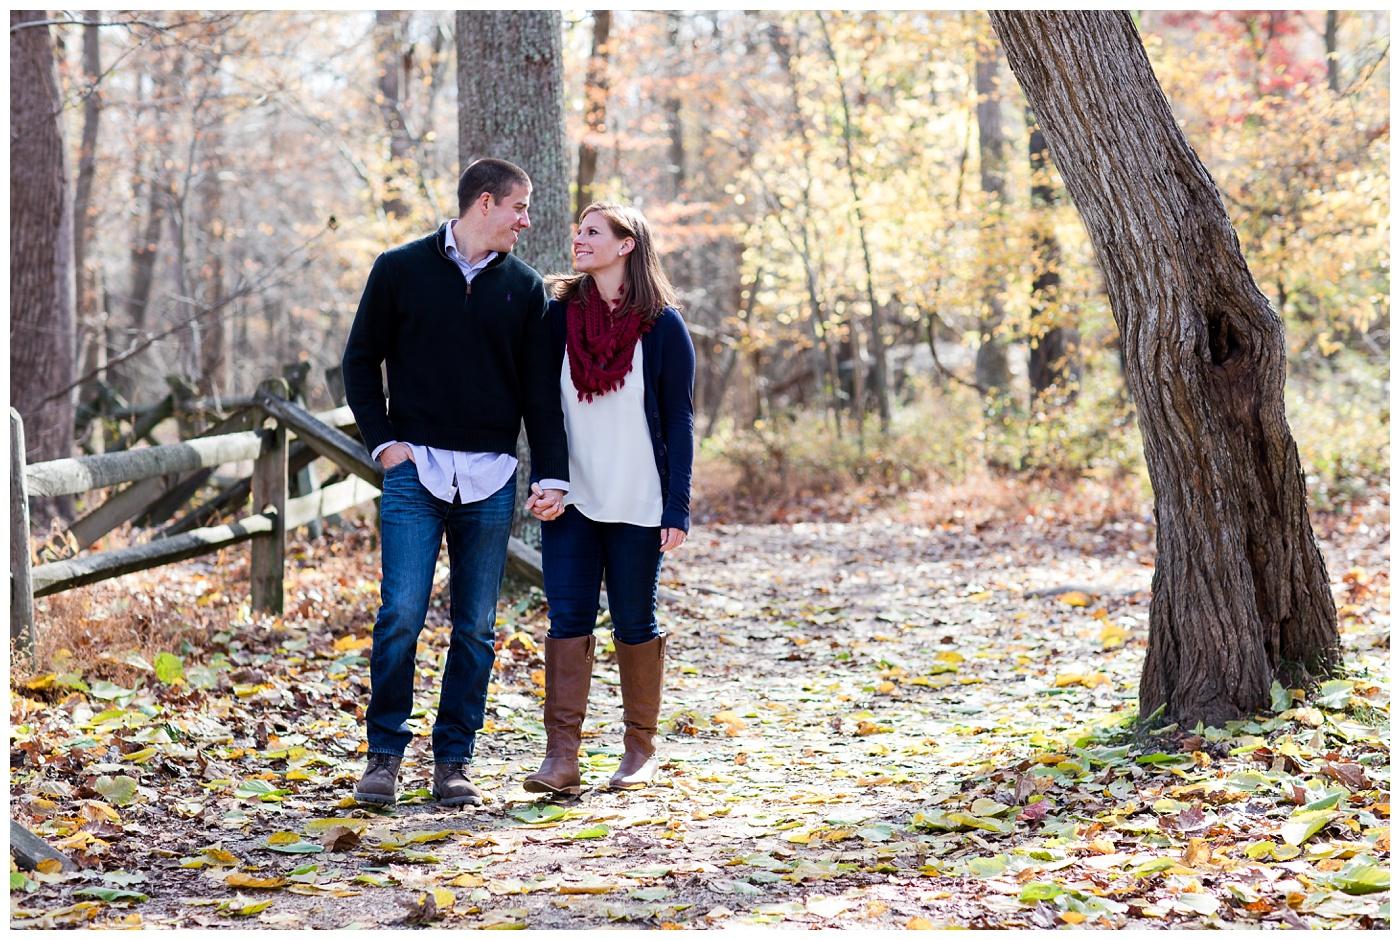 Brielle & David | Great Falls Park Engagement session